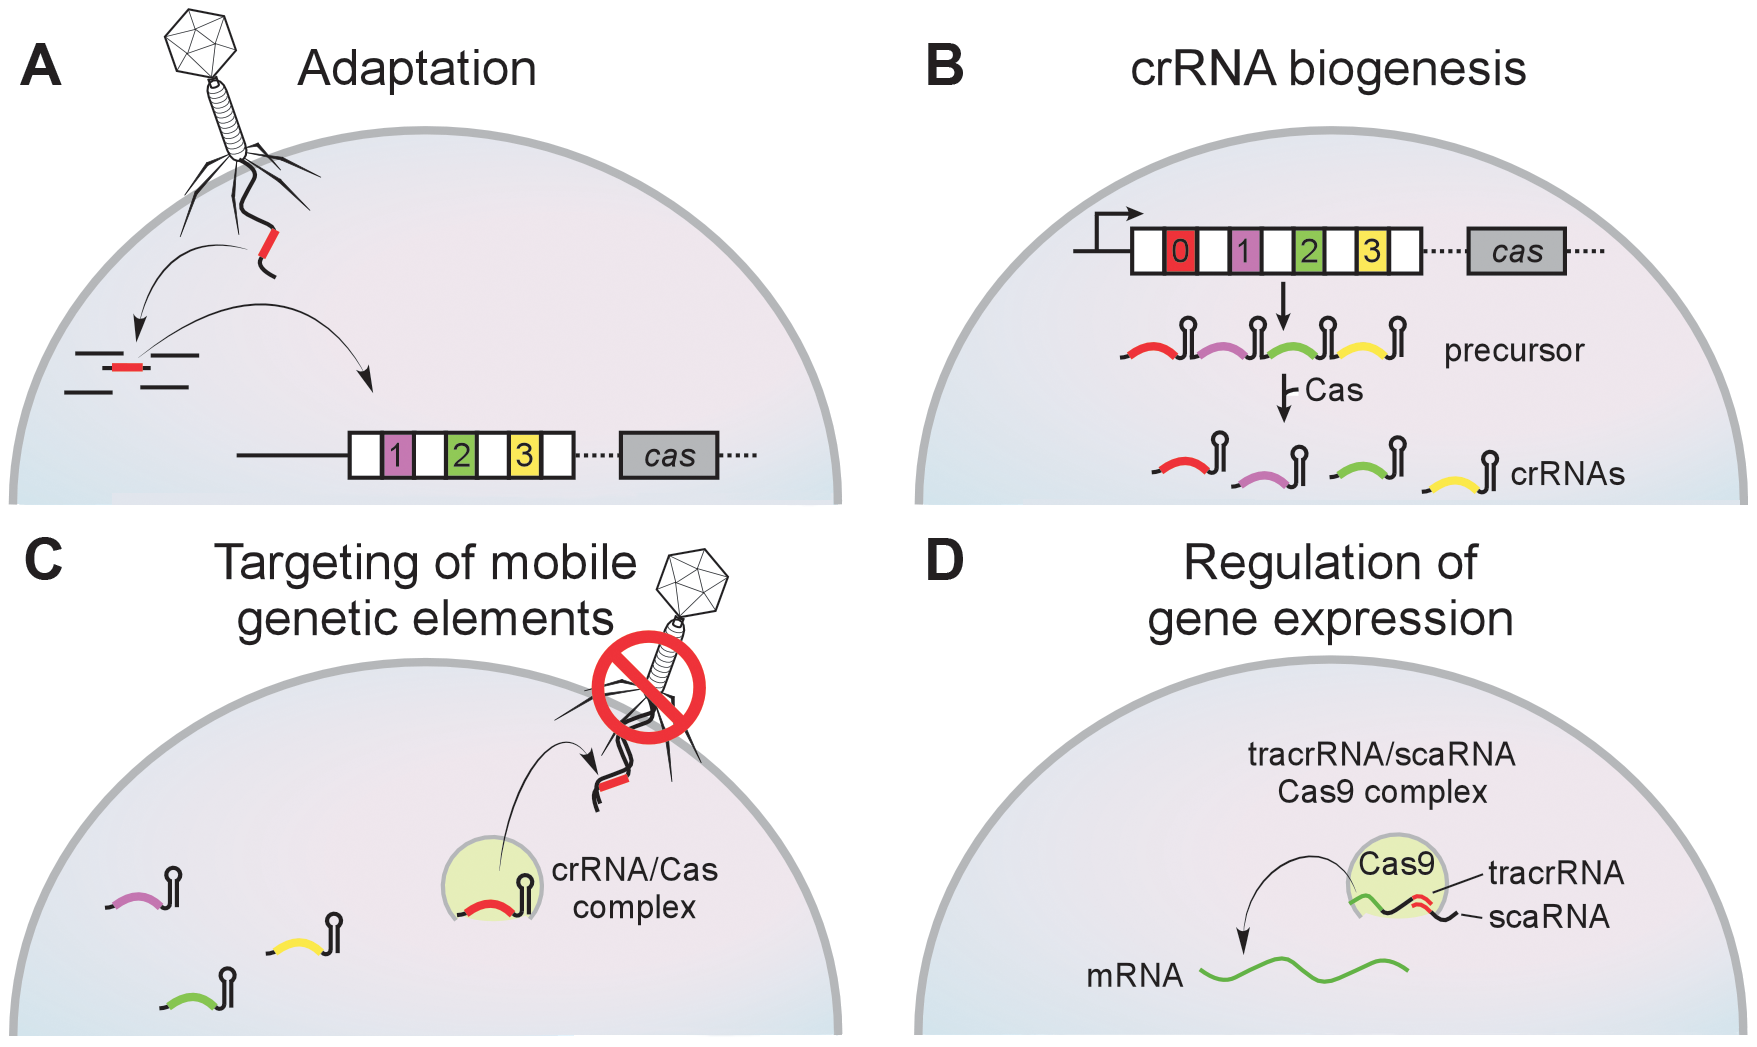 The CRISPR immunity pathway.